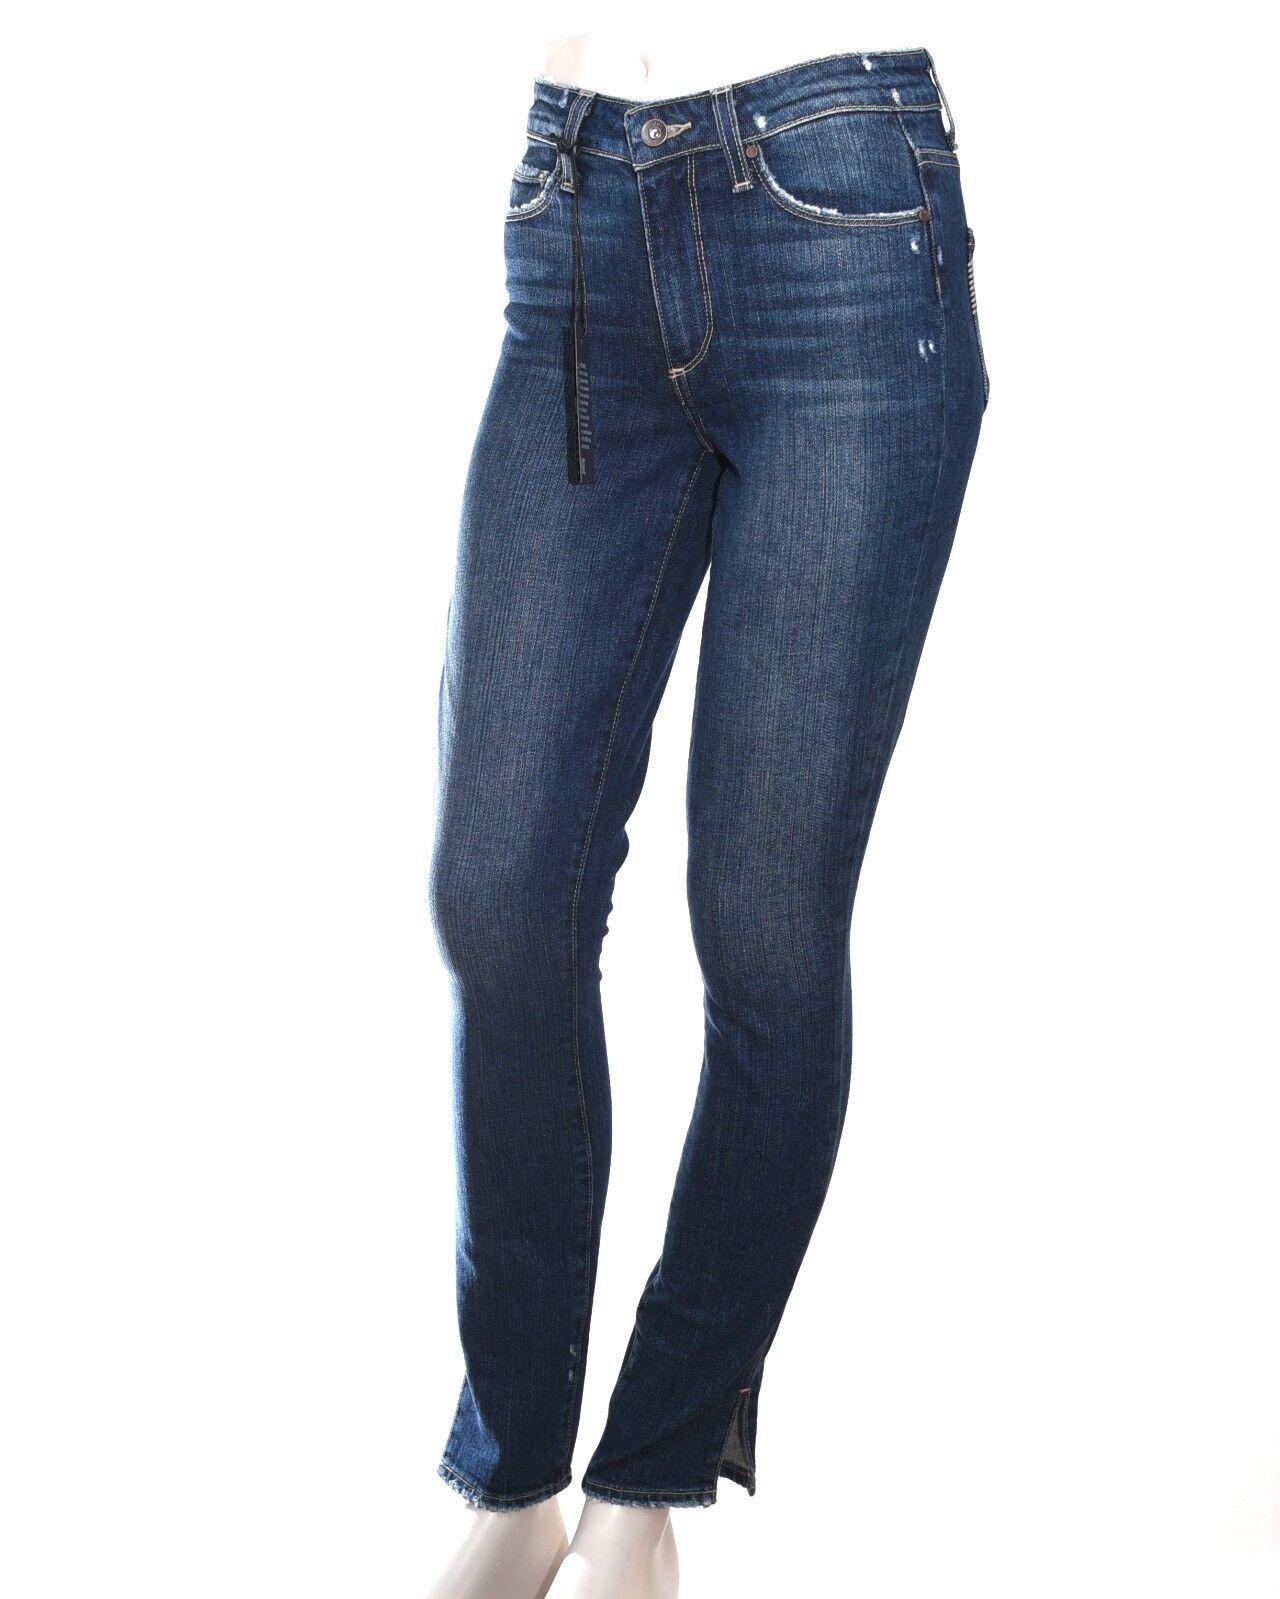 Paige Hoxton Ankle Peg Jeans Sz 24 Dark Vintage Denim High Rise Skinny Ankle NWT